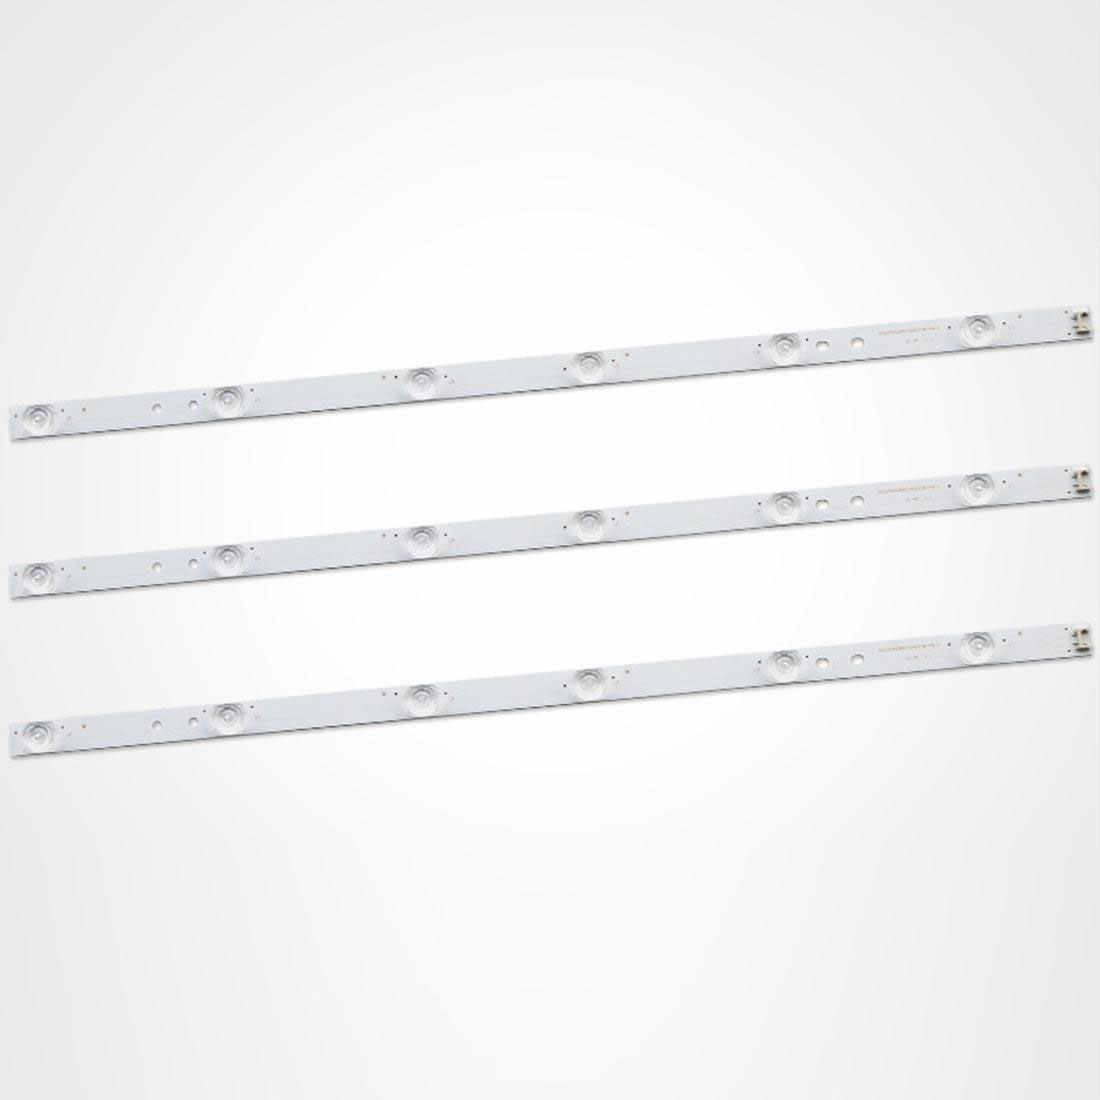 LED شريط إضاءة خلفي 7 مصباح ل LG 32 بوصة 6916L-1437A 6916L-1438A ضوء متغير اللون الزخرفية لام led كابل يو اس بي Led الإضاءة